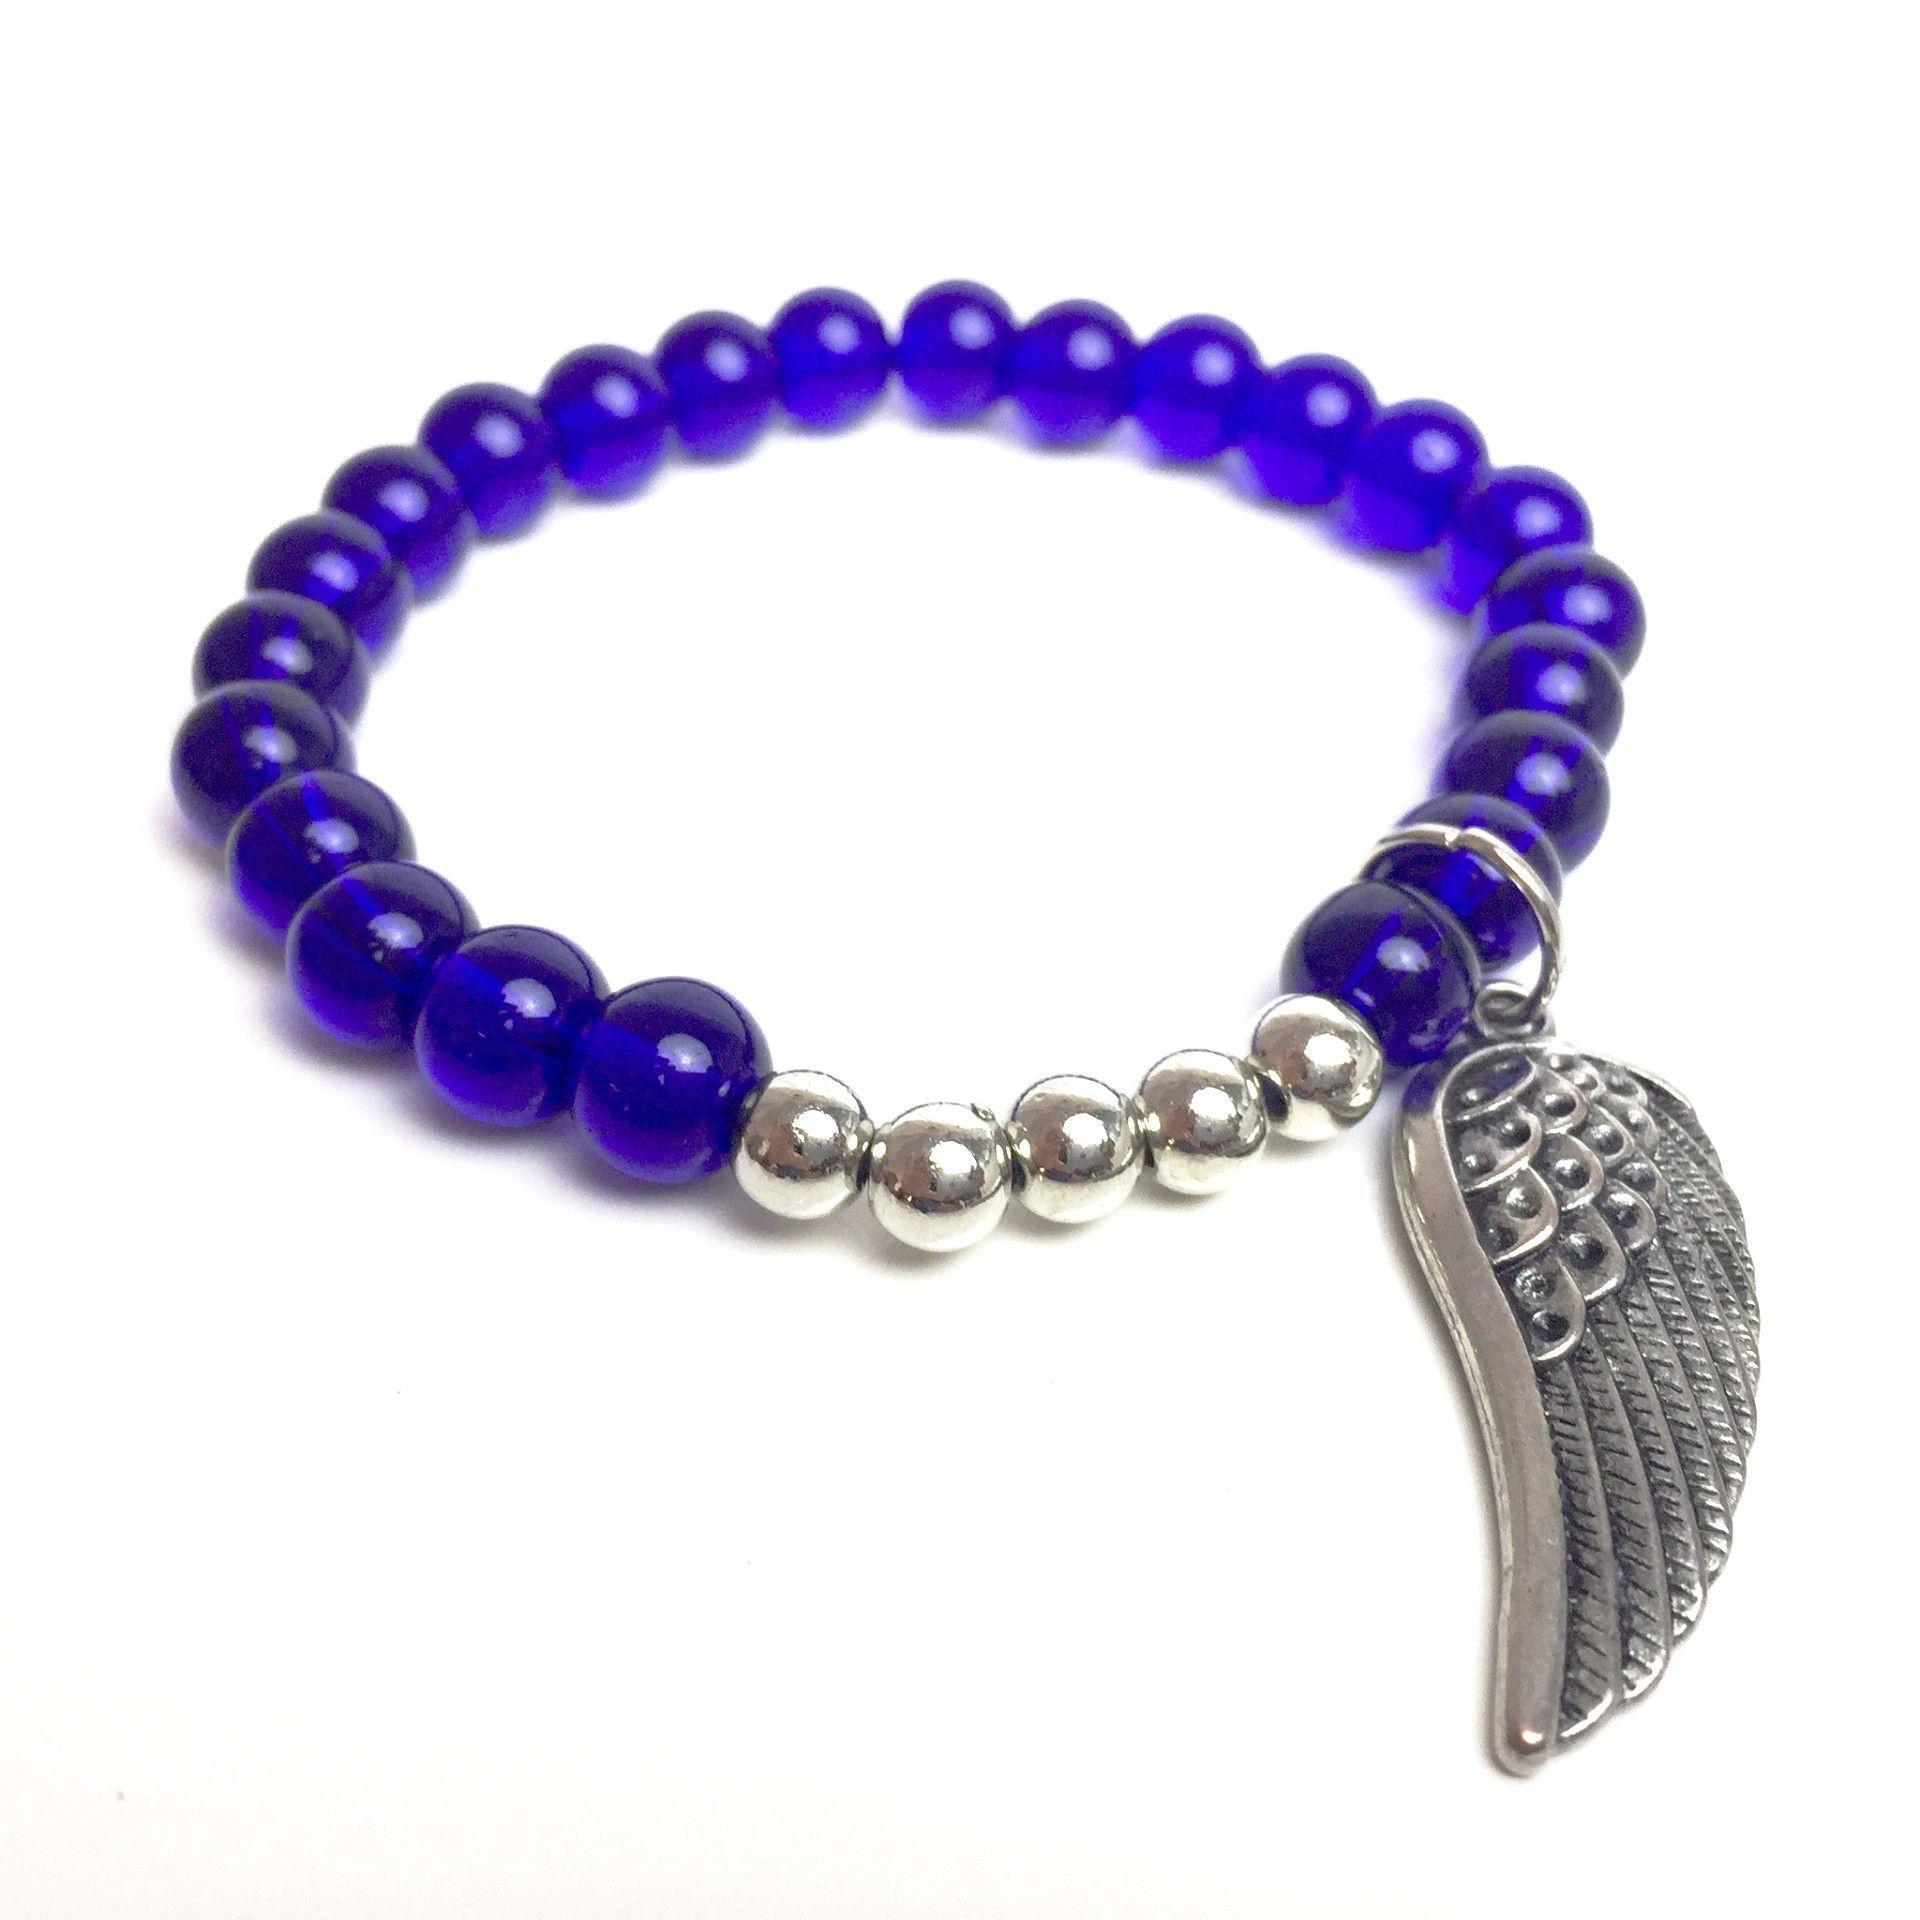 Wings to Fly Charm Bracelet with Clear Dark Blue /Indigo Czech Glass Beads